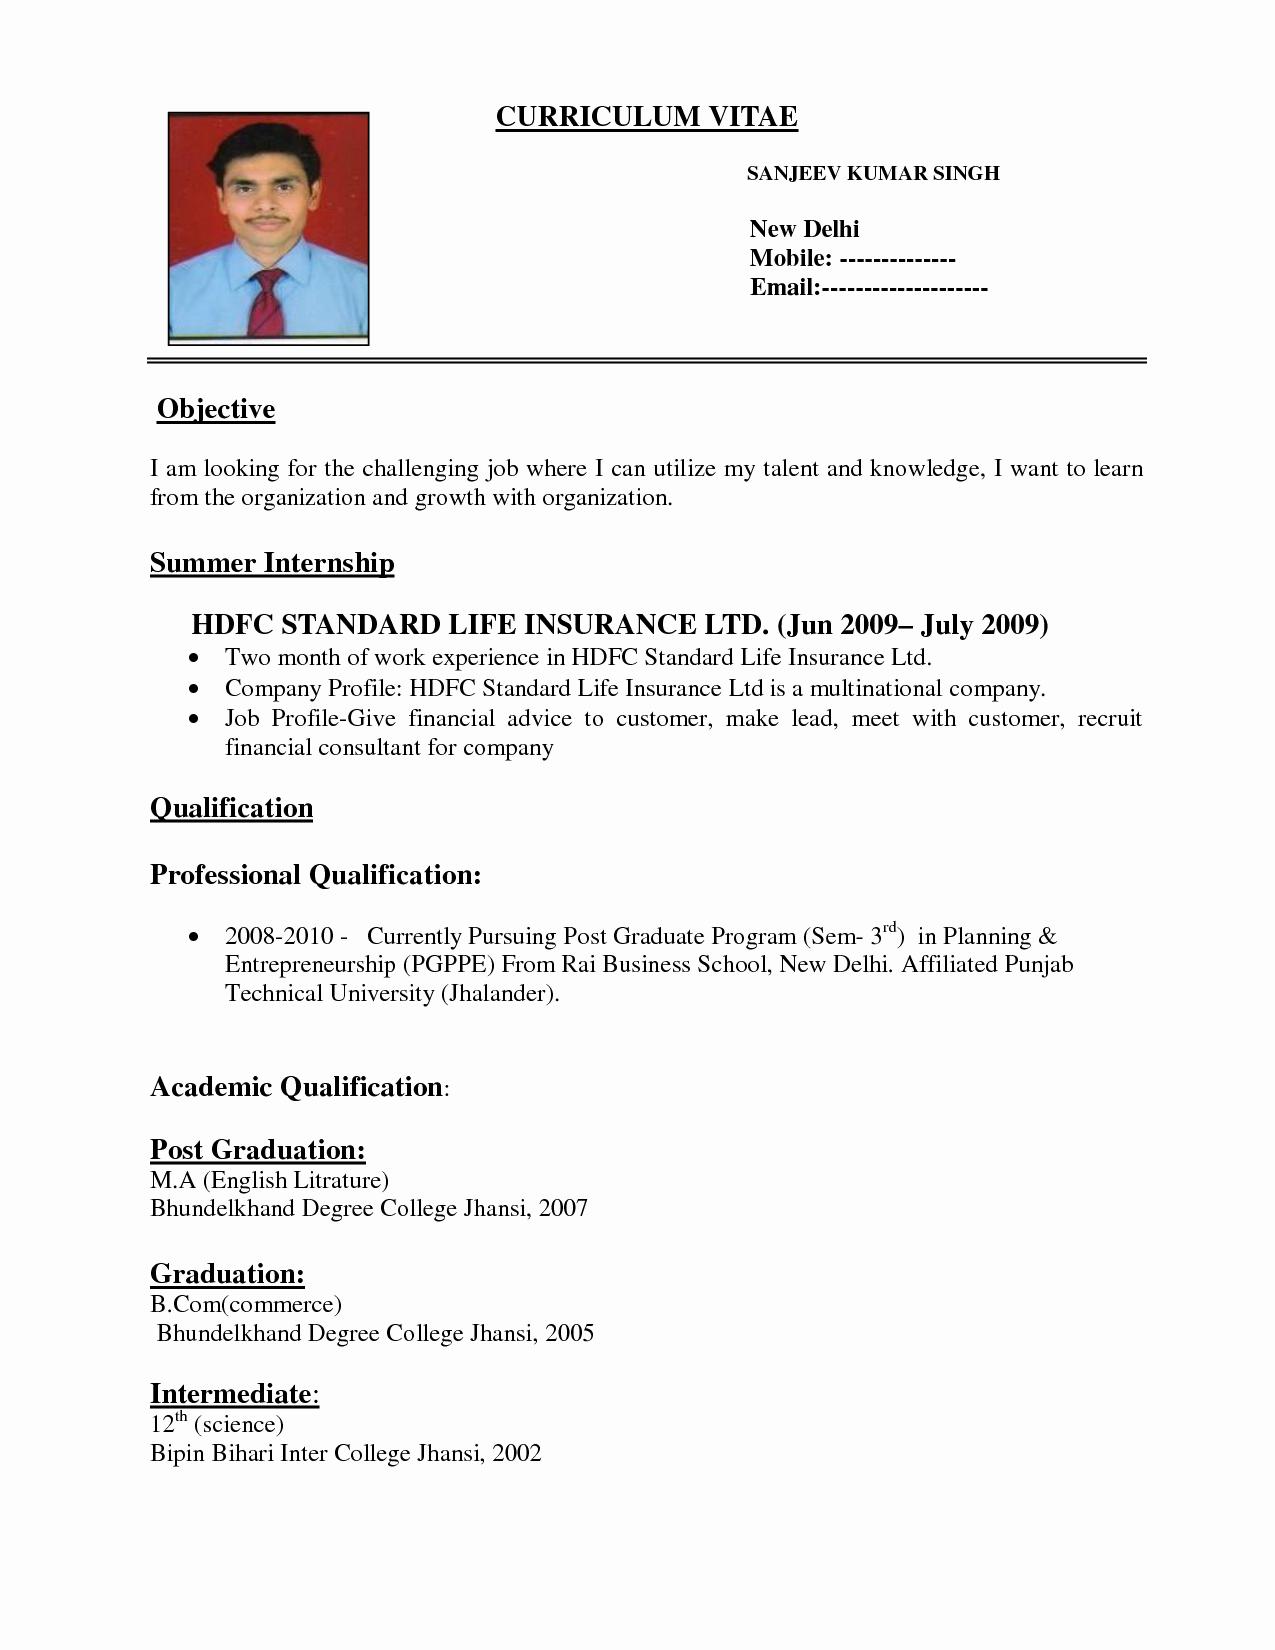 Format for Curriculum Vitae Awesome Curriculum Vitae format